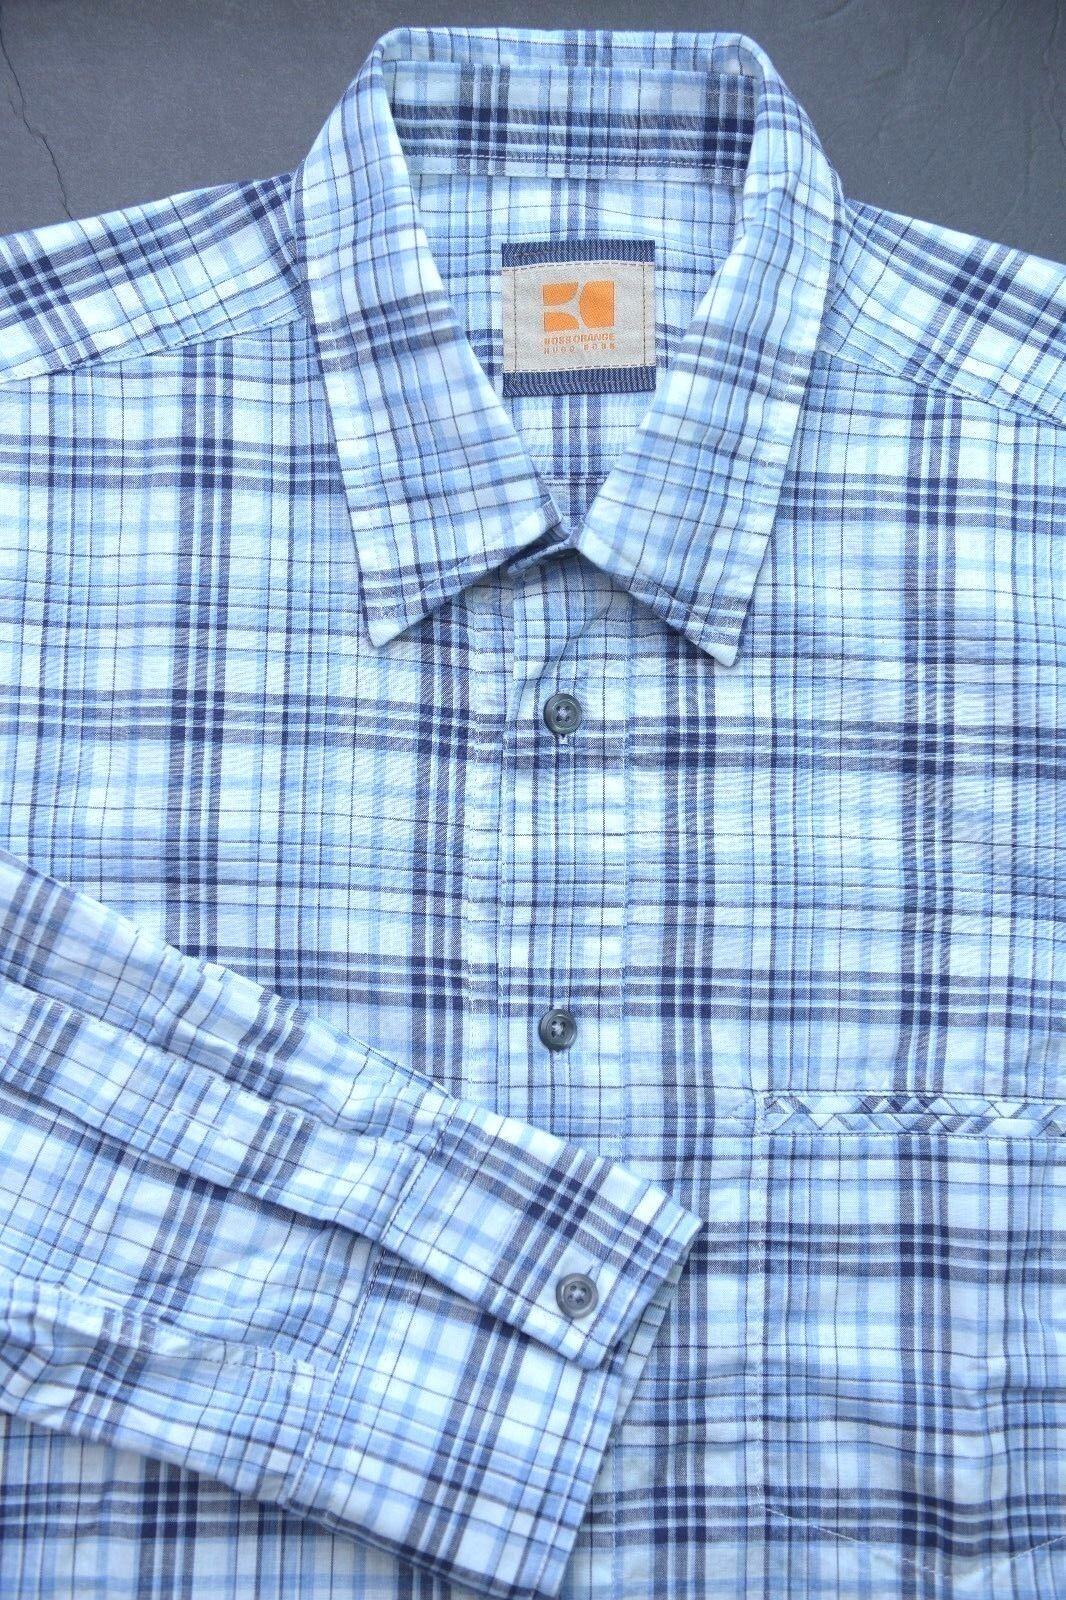 Hugo Boss orange Men's CieloebuE bluee Plaids Cotton Casual Shirt New M